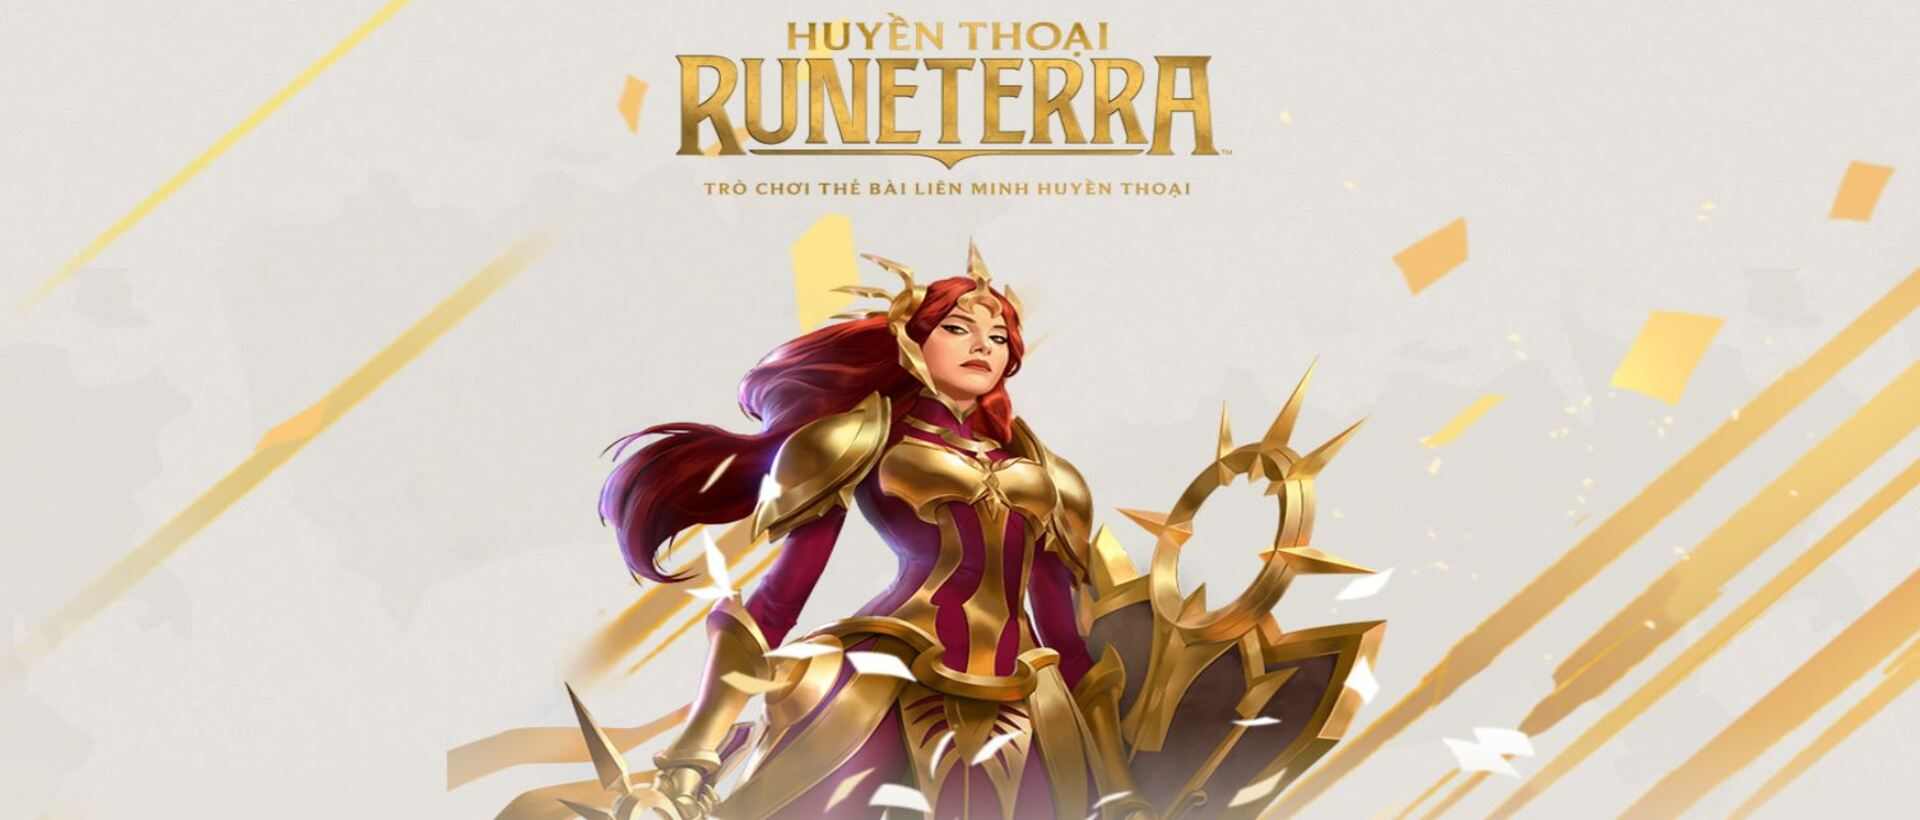 Huyền Thoại Runeterra